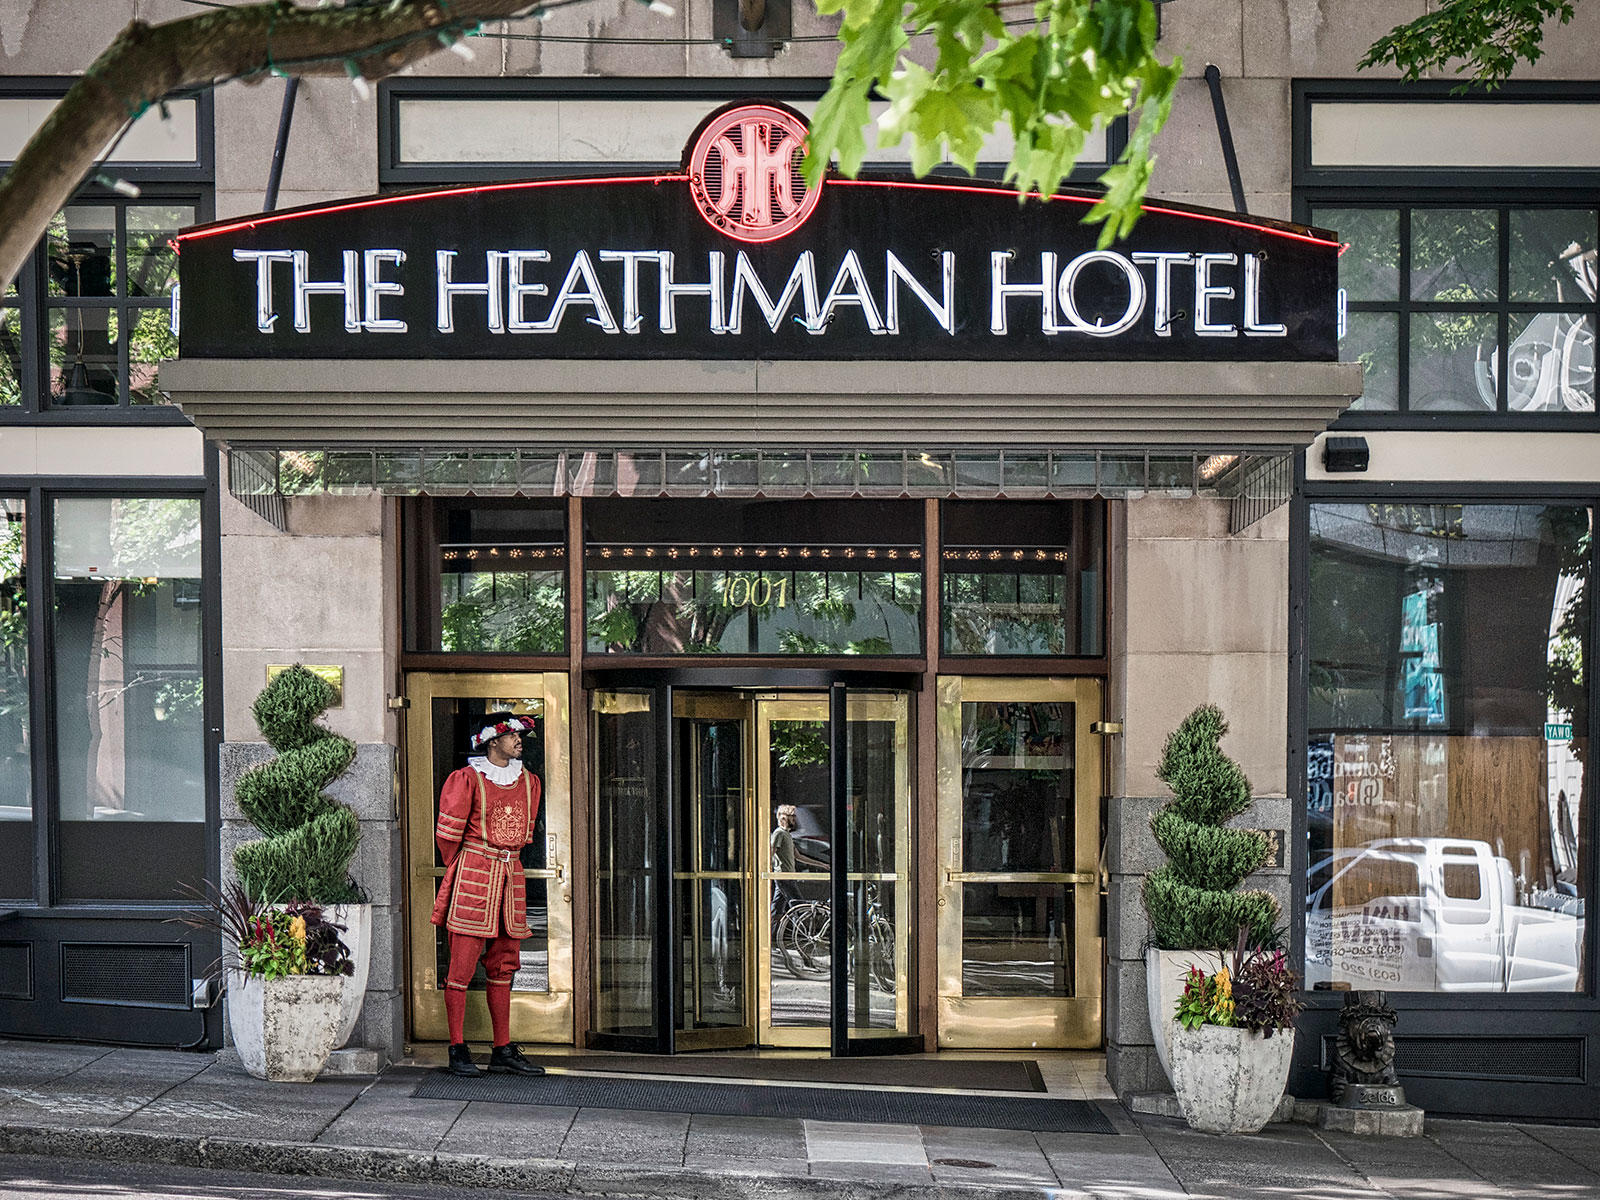 The Heathman Hotel image 1